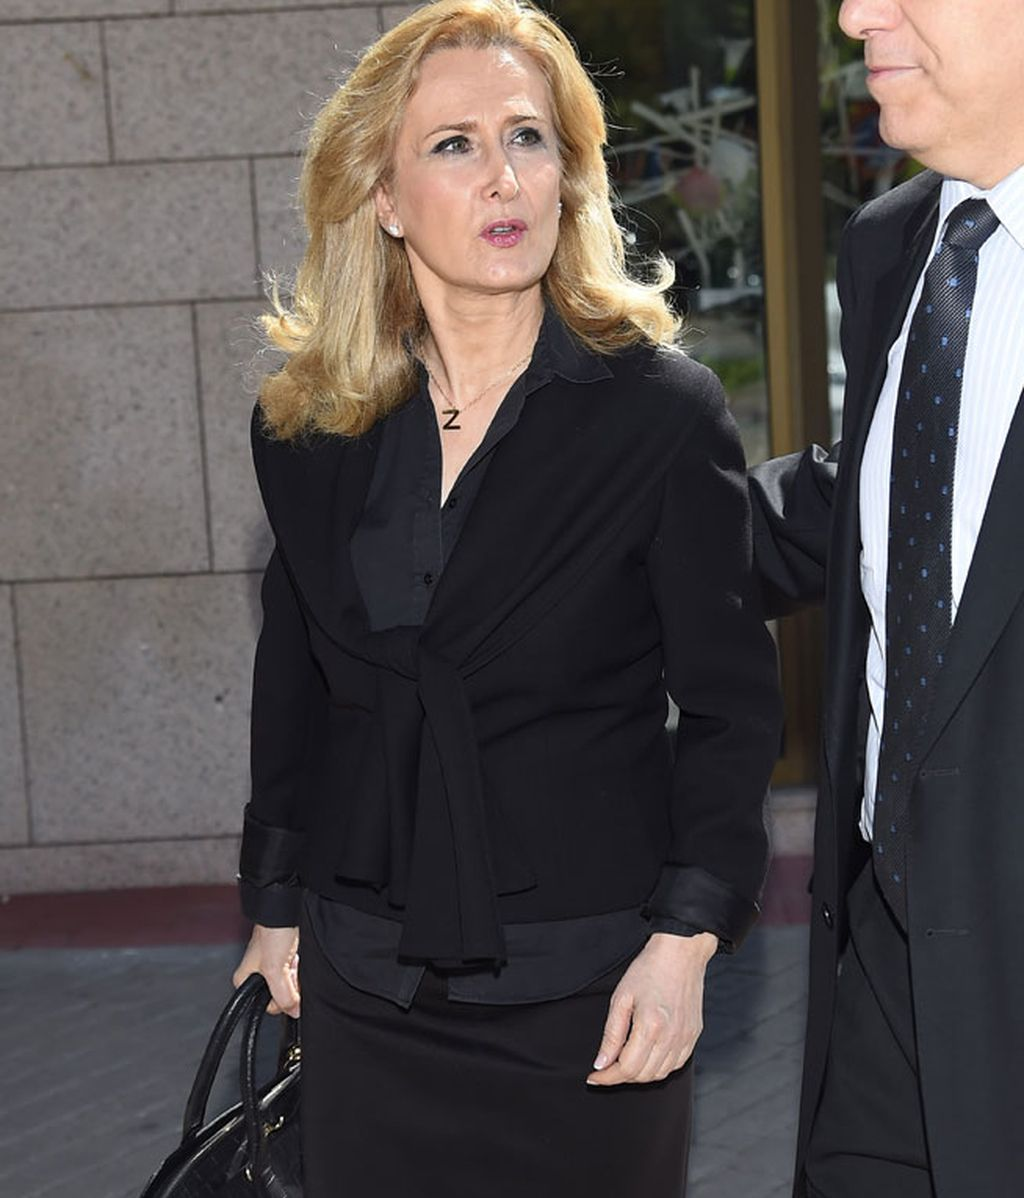 La periodista Nieves Herrero